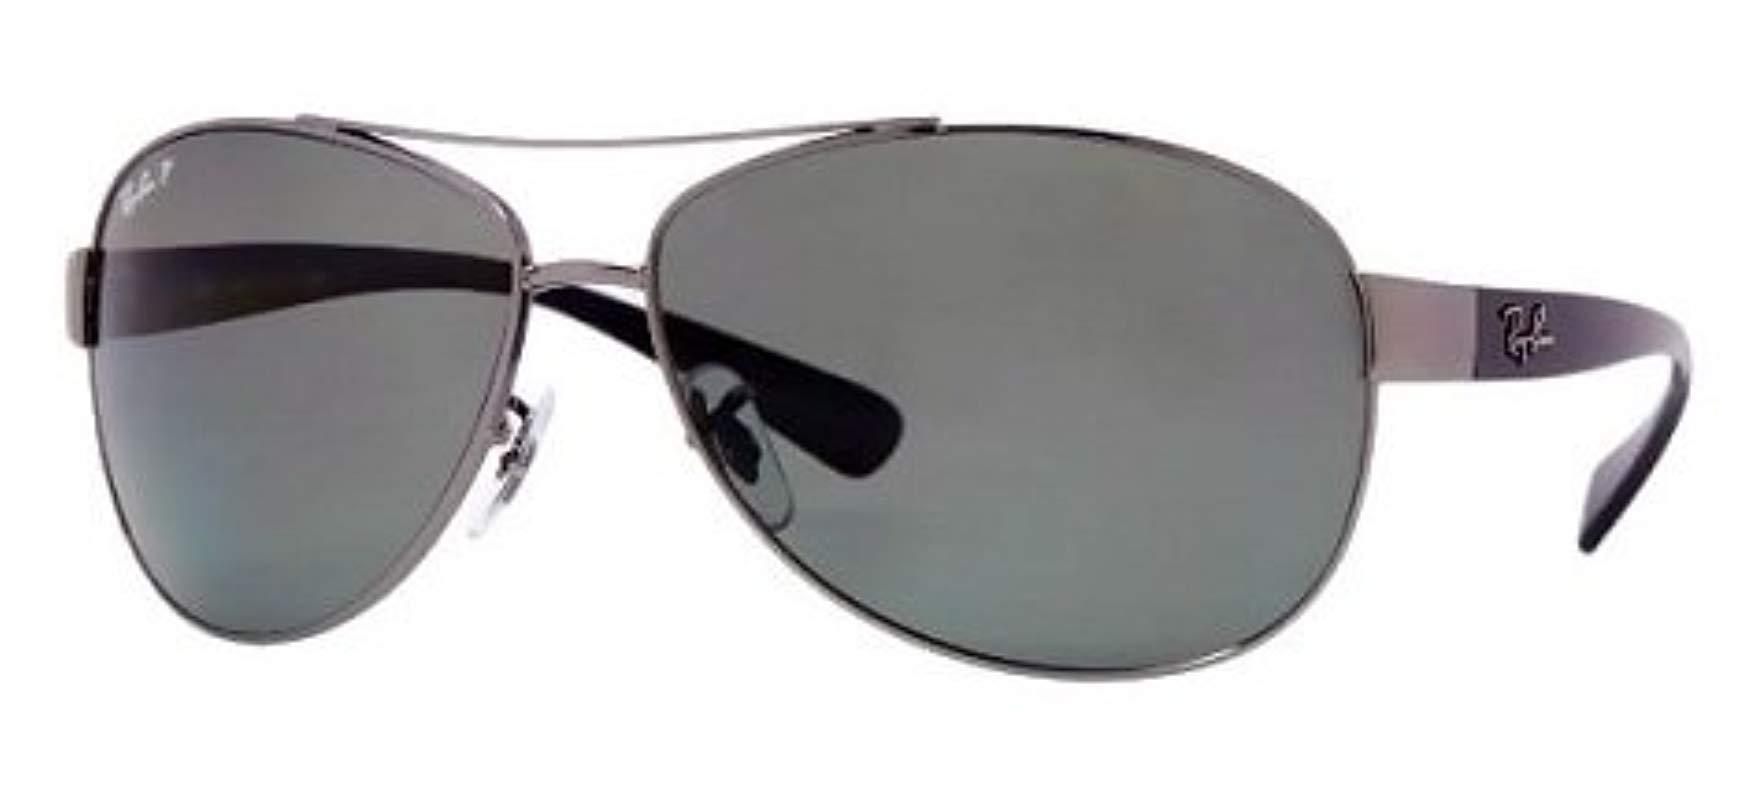 9fd1c3f2766d3 Lyst - Ray-Ban Rb 3386 Sunglasses in Black